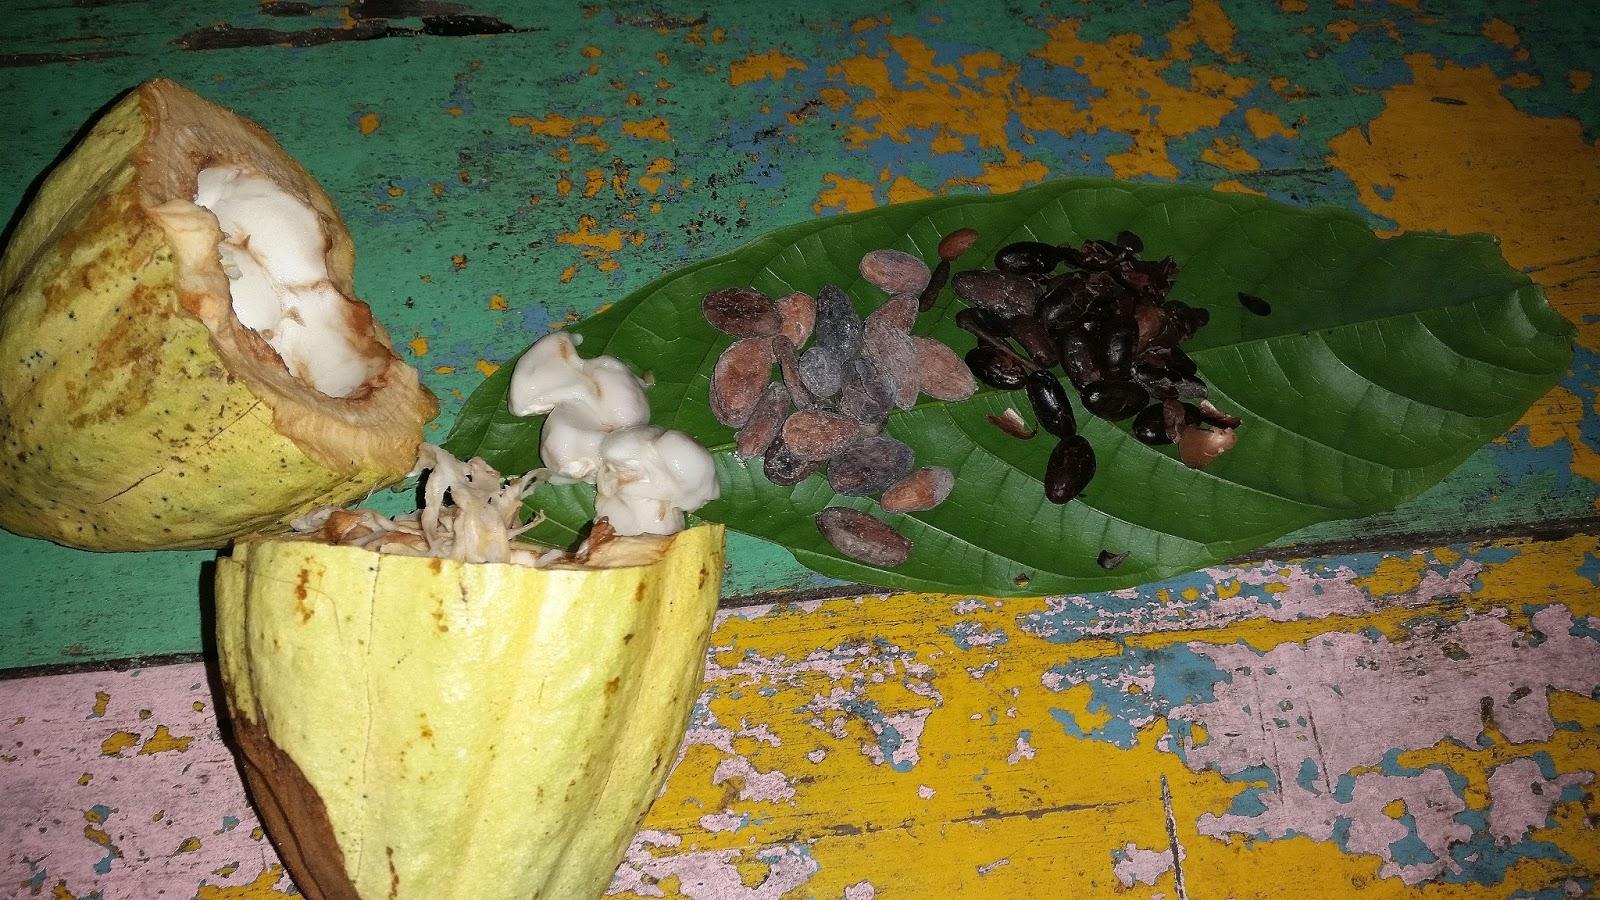 Dominikana Proces produkcji kakao ziarna